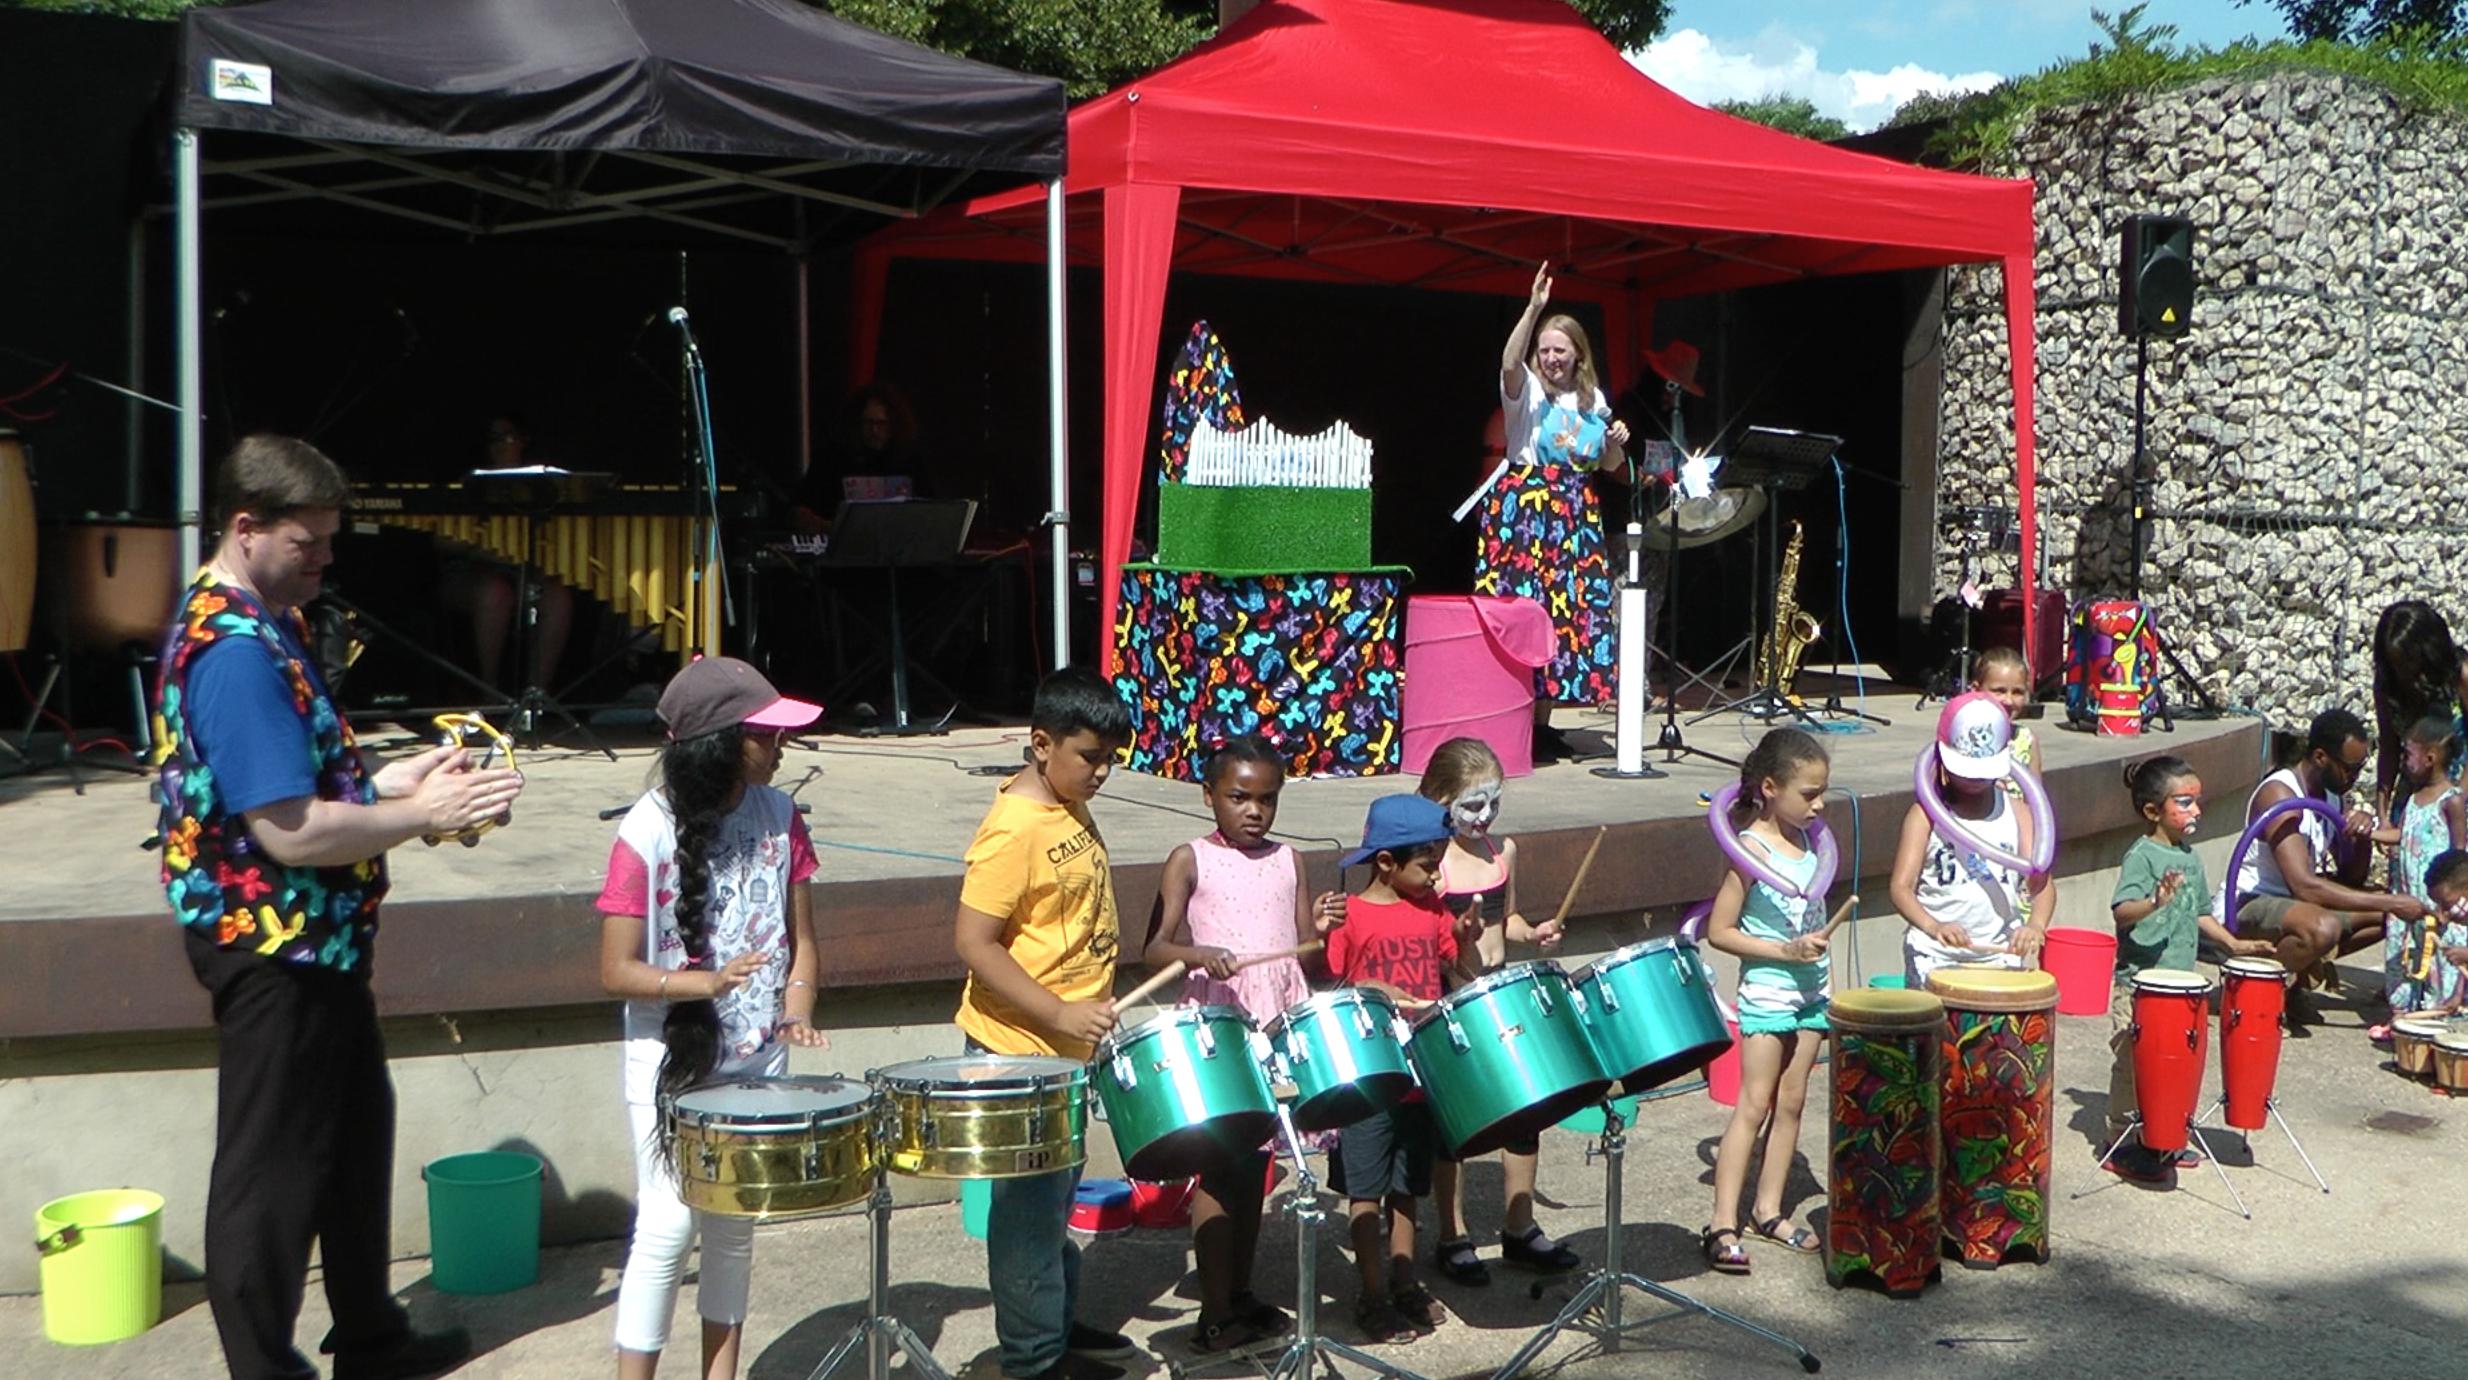 Musical Balloon Band Steel Pans